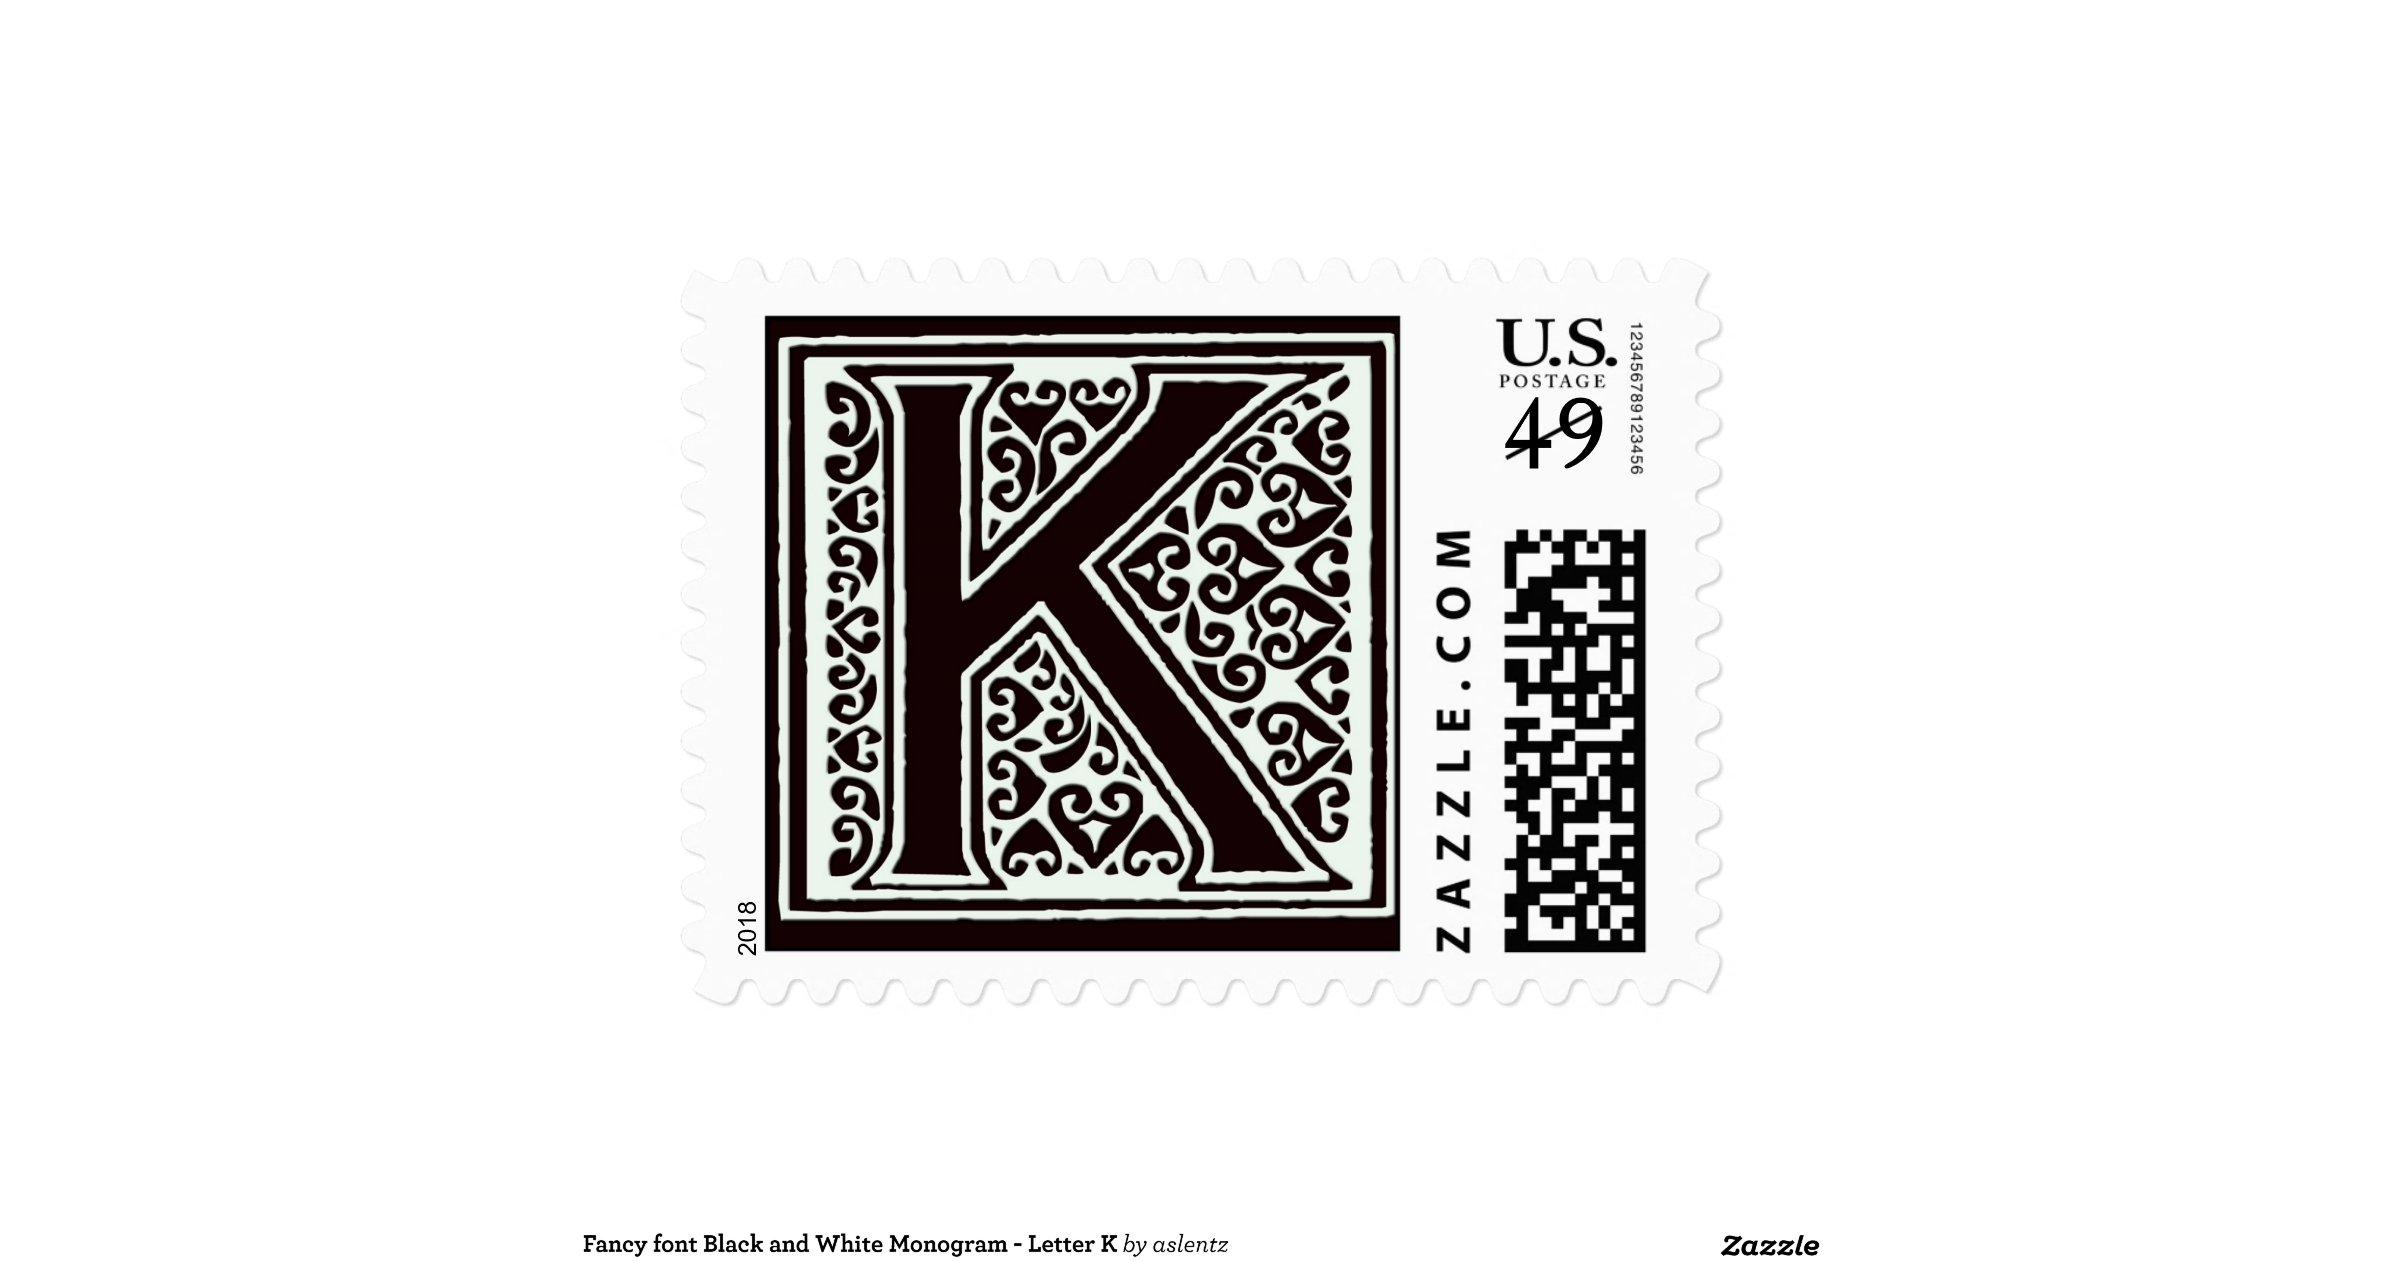 Fancy_font_black_and_white_monogram_letter_k_postage 172974323890185834 on Pre K Letter Art